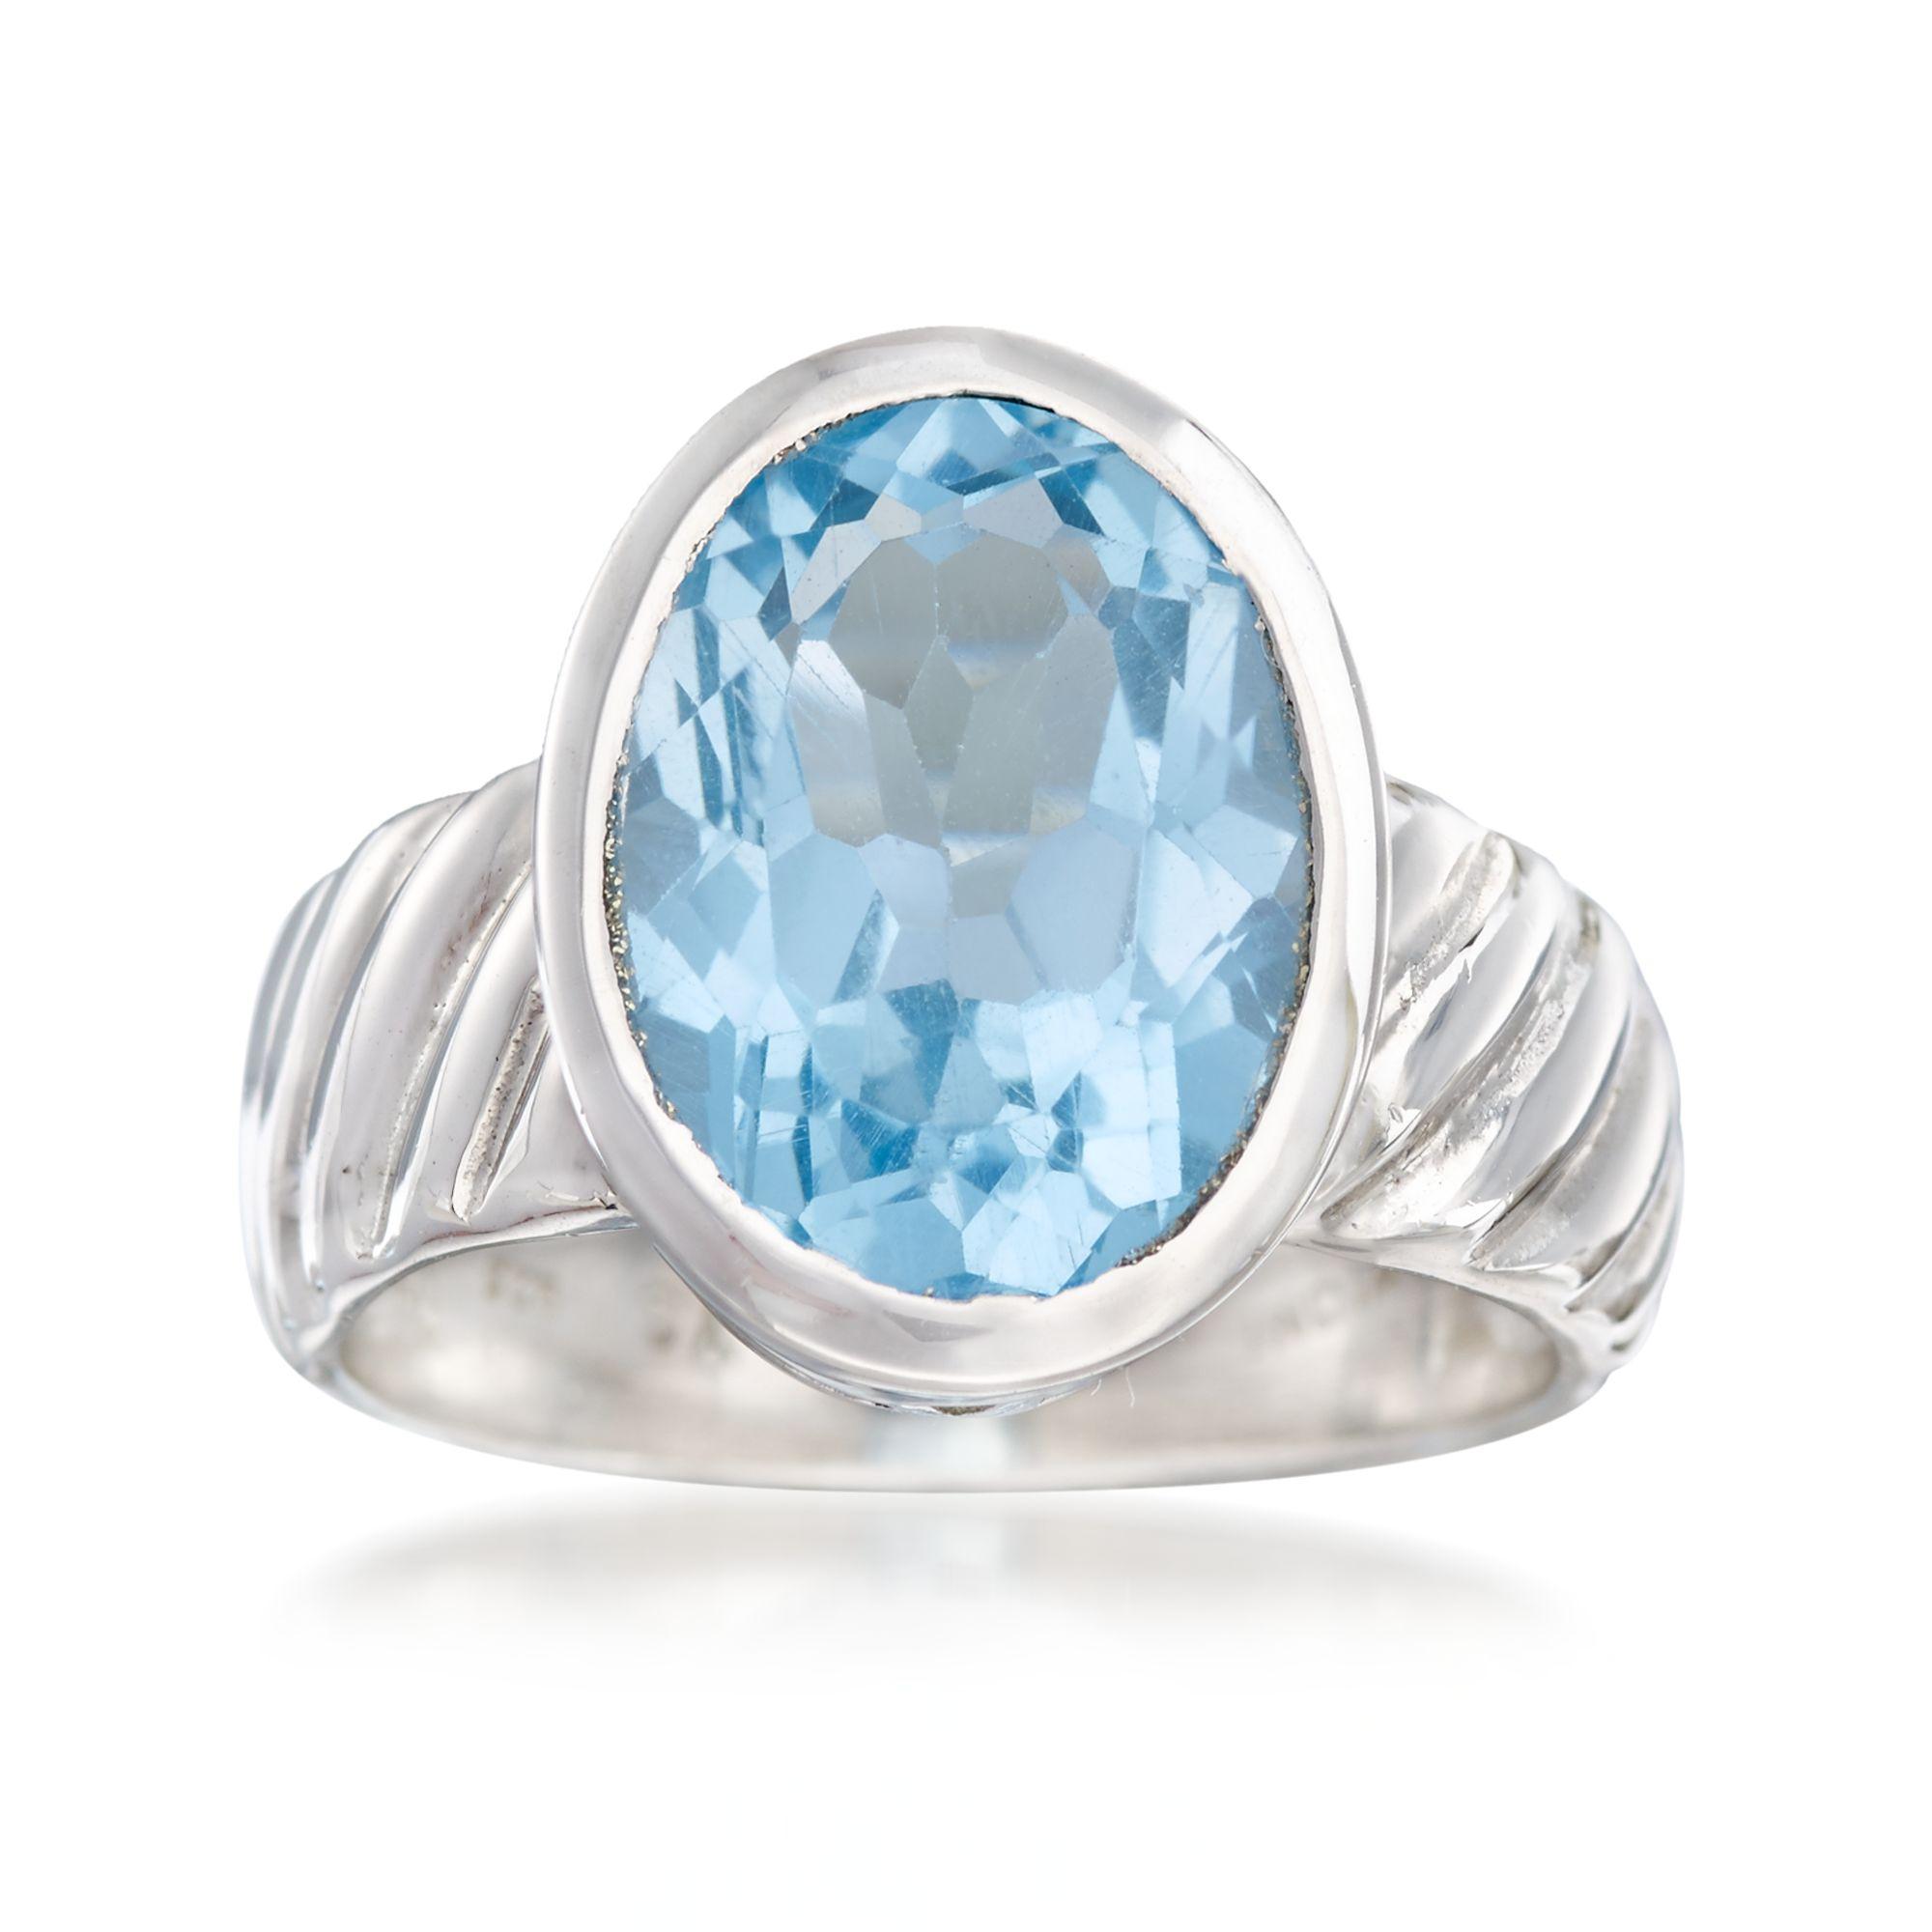 Blue Topaz Spinner Ring Narrow BrassSilver Mistry Gems Wedding Band SP46BT Blue Topaz Ring November Birthstone Jewellery